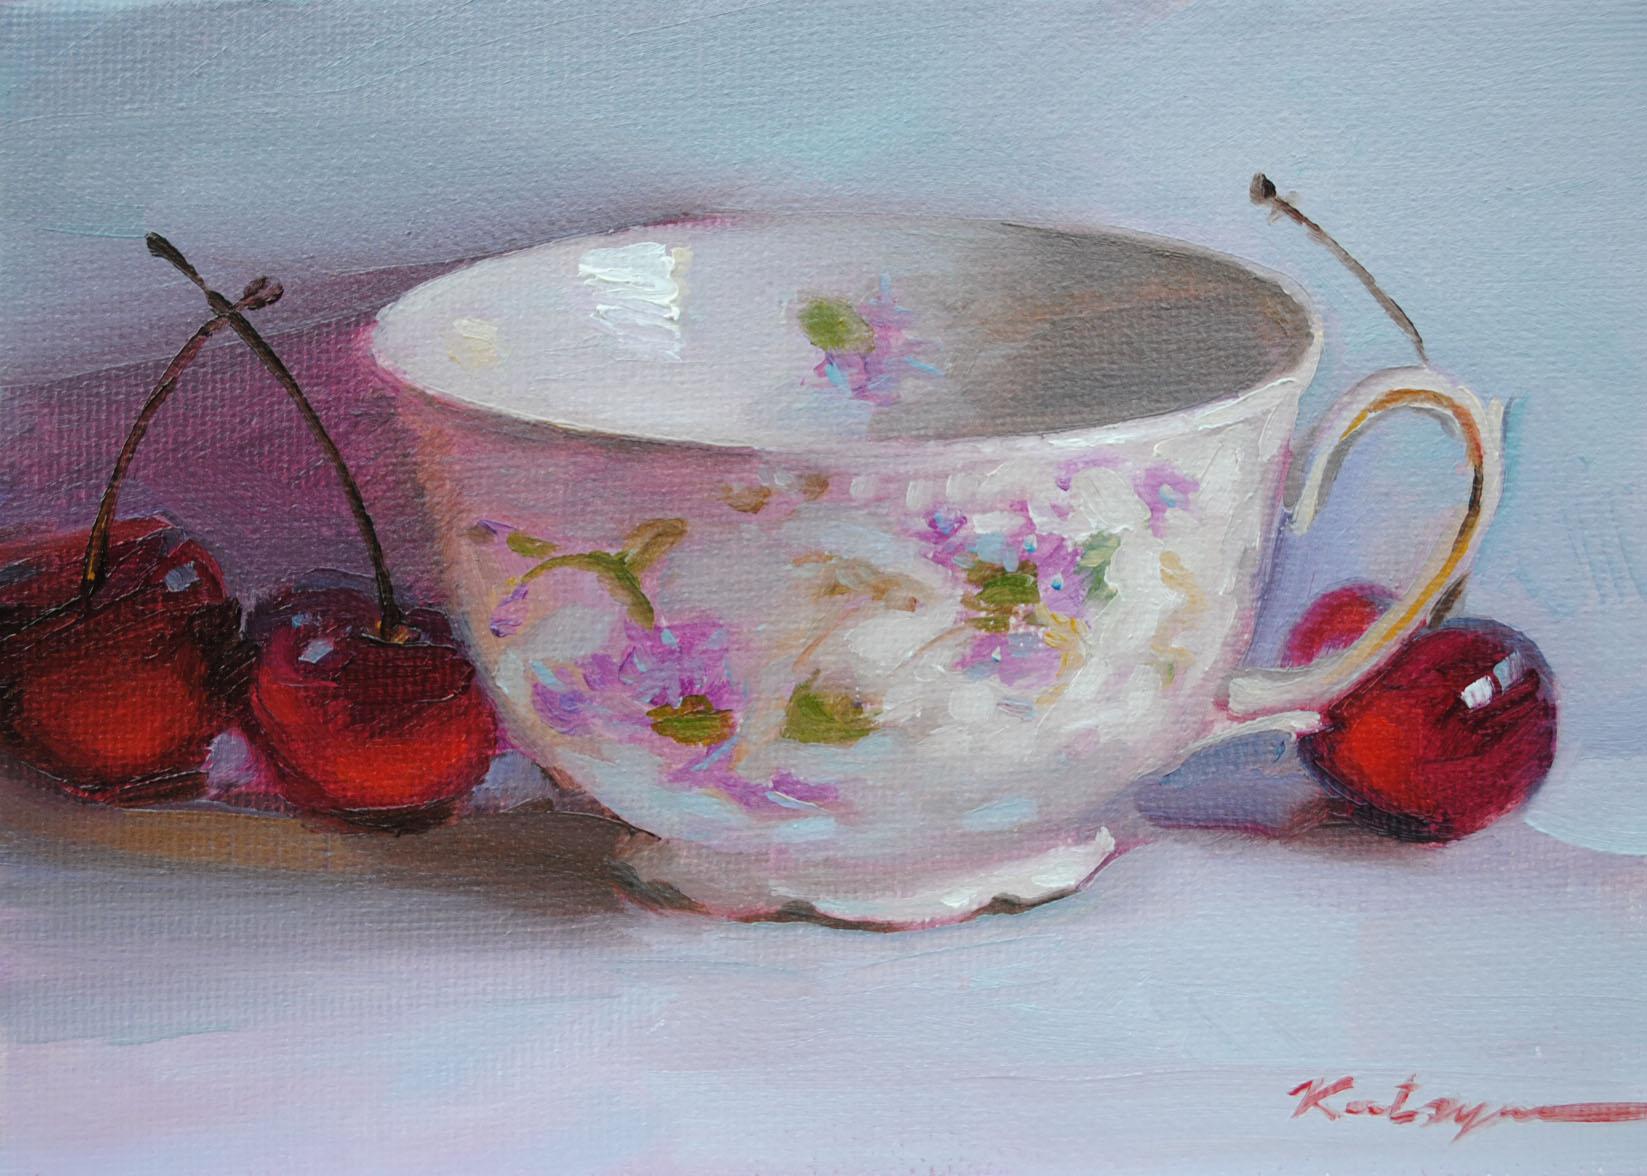 """Flower Cup"" original fine art by Elena Katsyura"